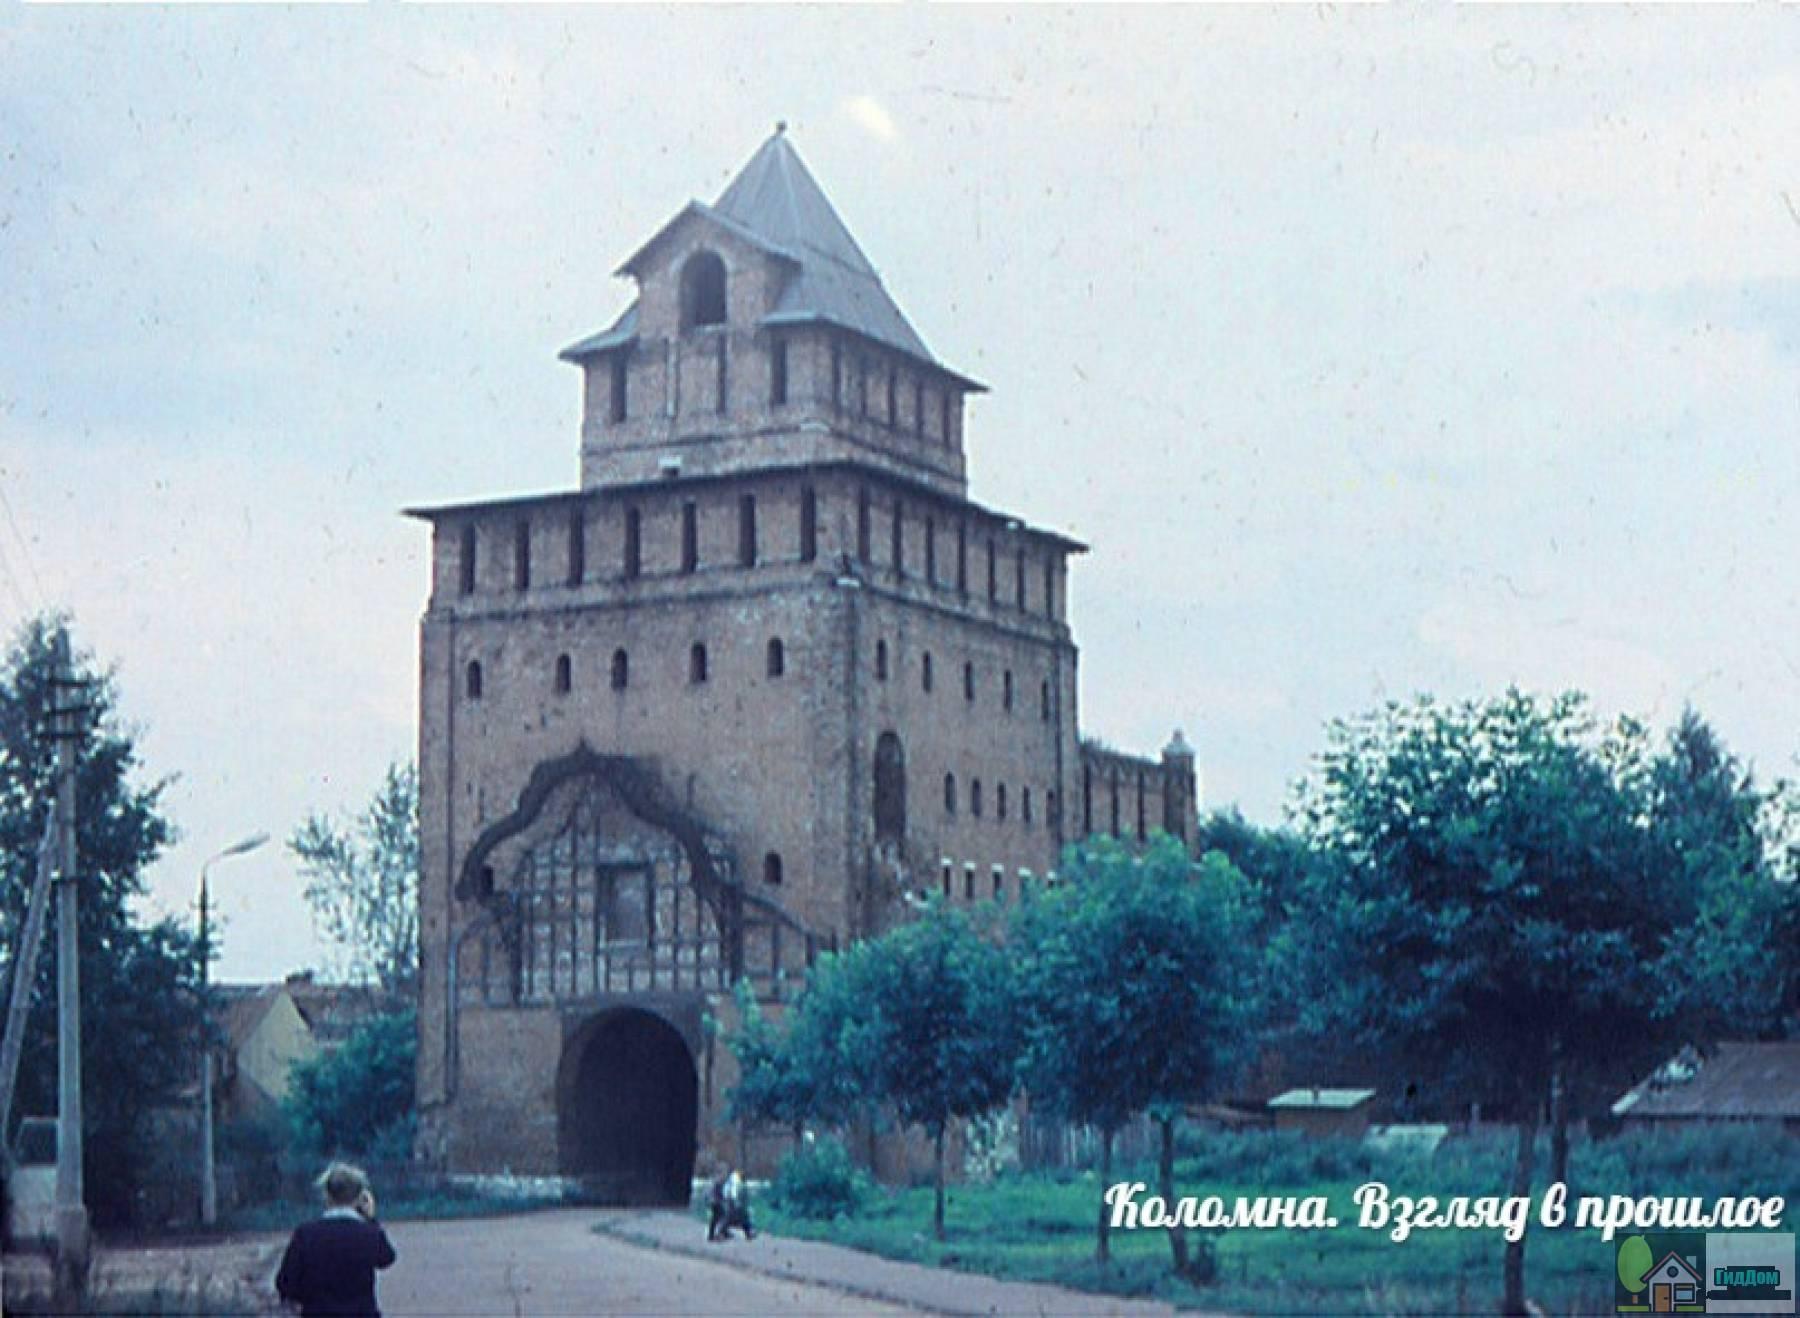 Пятницкие ворота на фотографии 1973 года